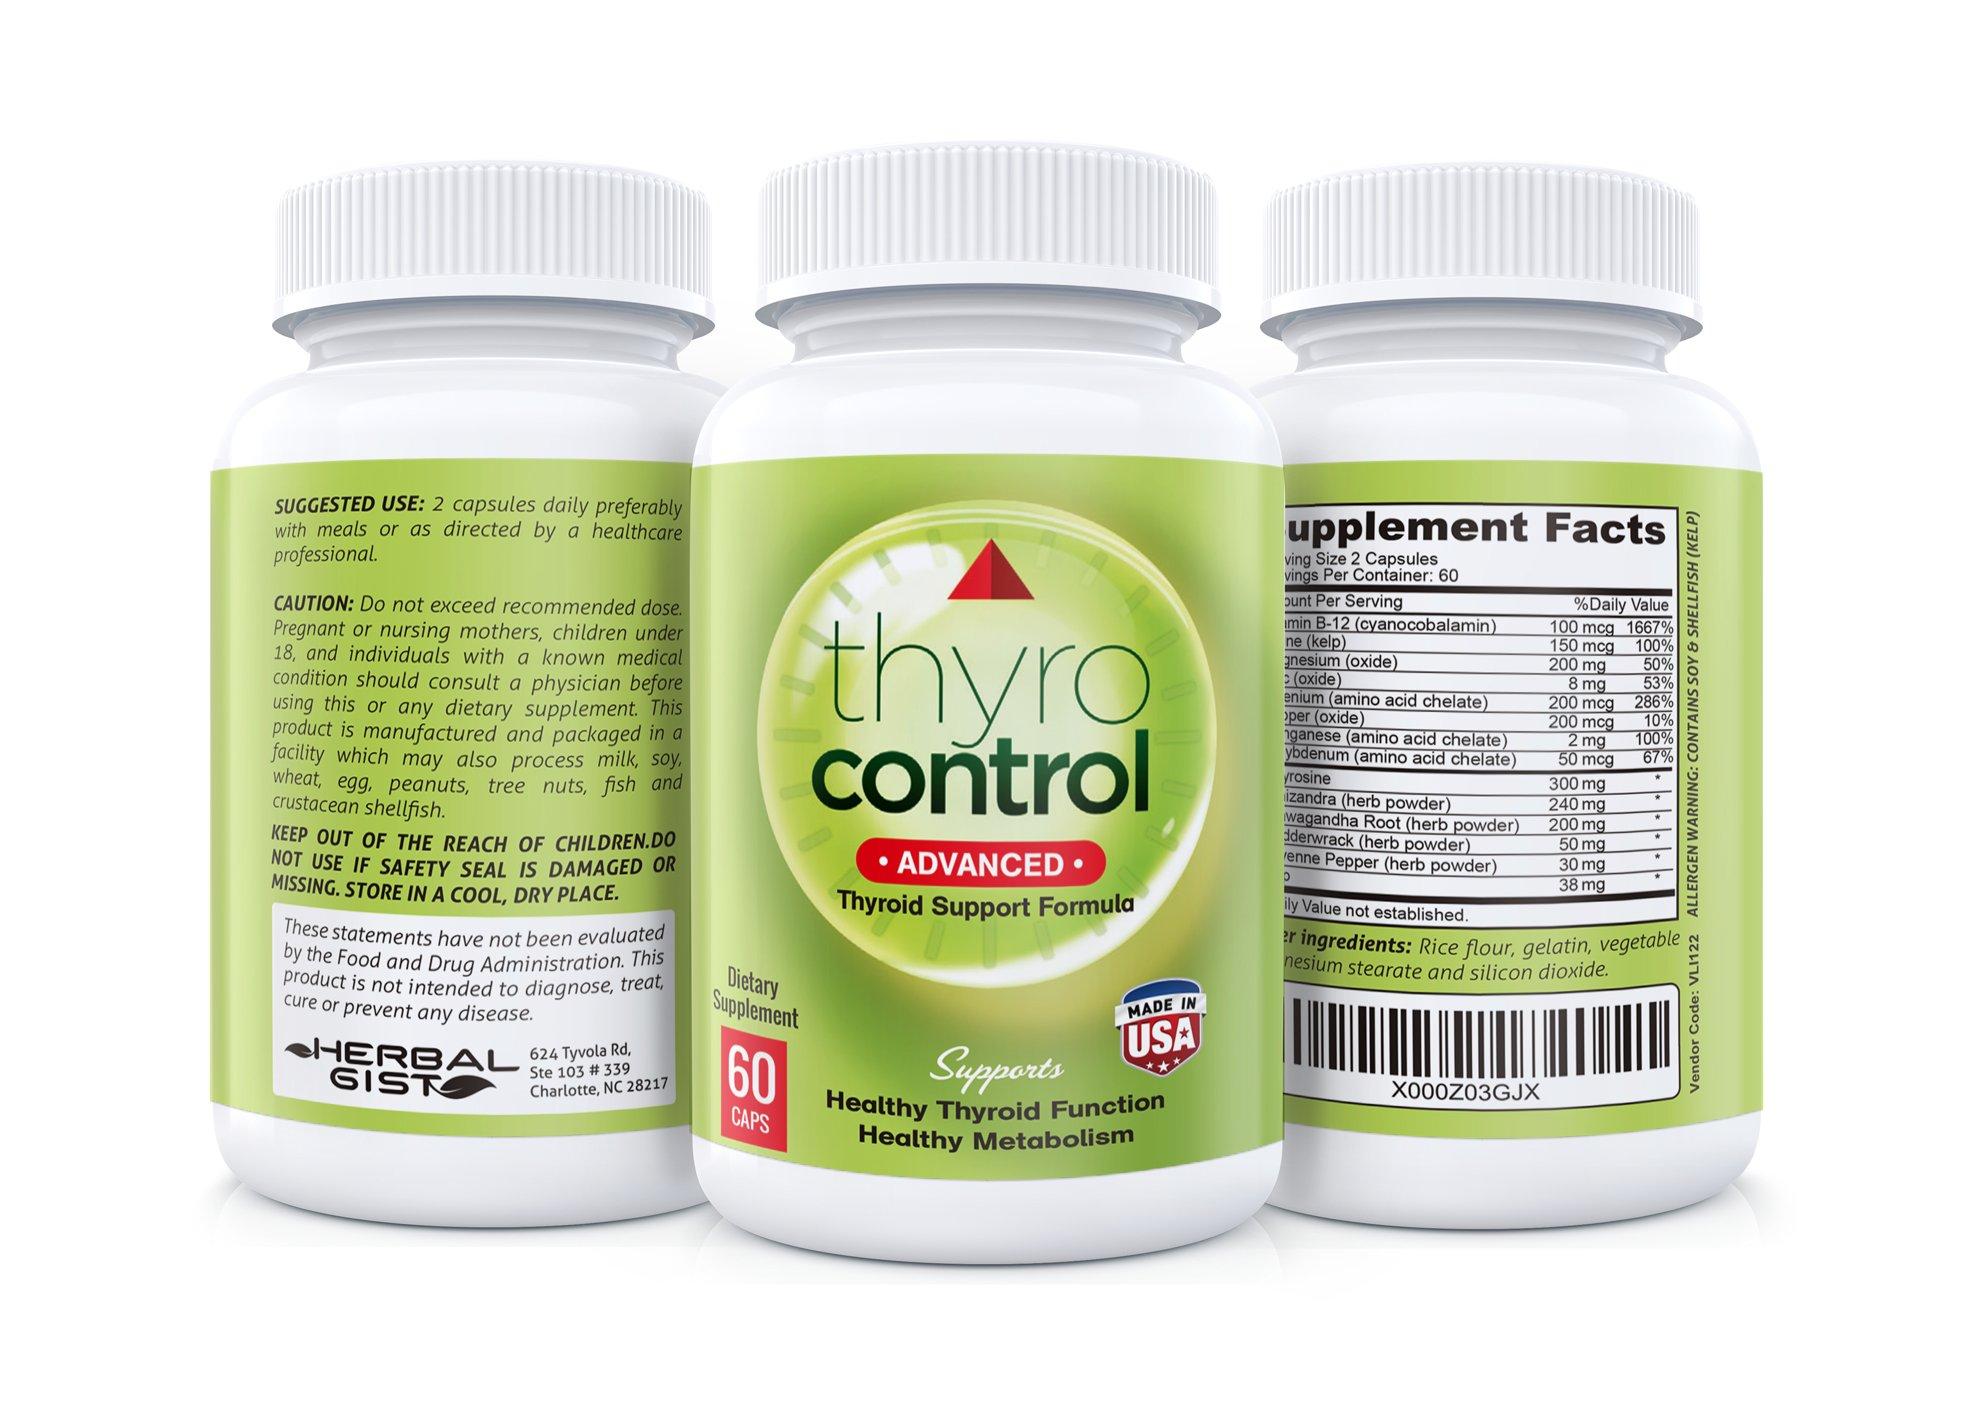 ThyroControl - Thyroid Support Supplement, 30 Day Supply by HerbalGist